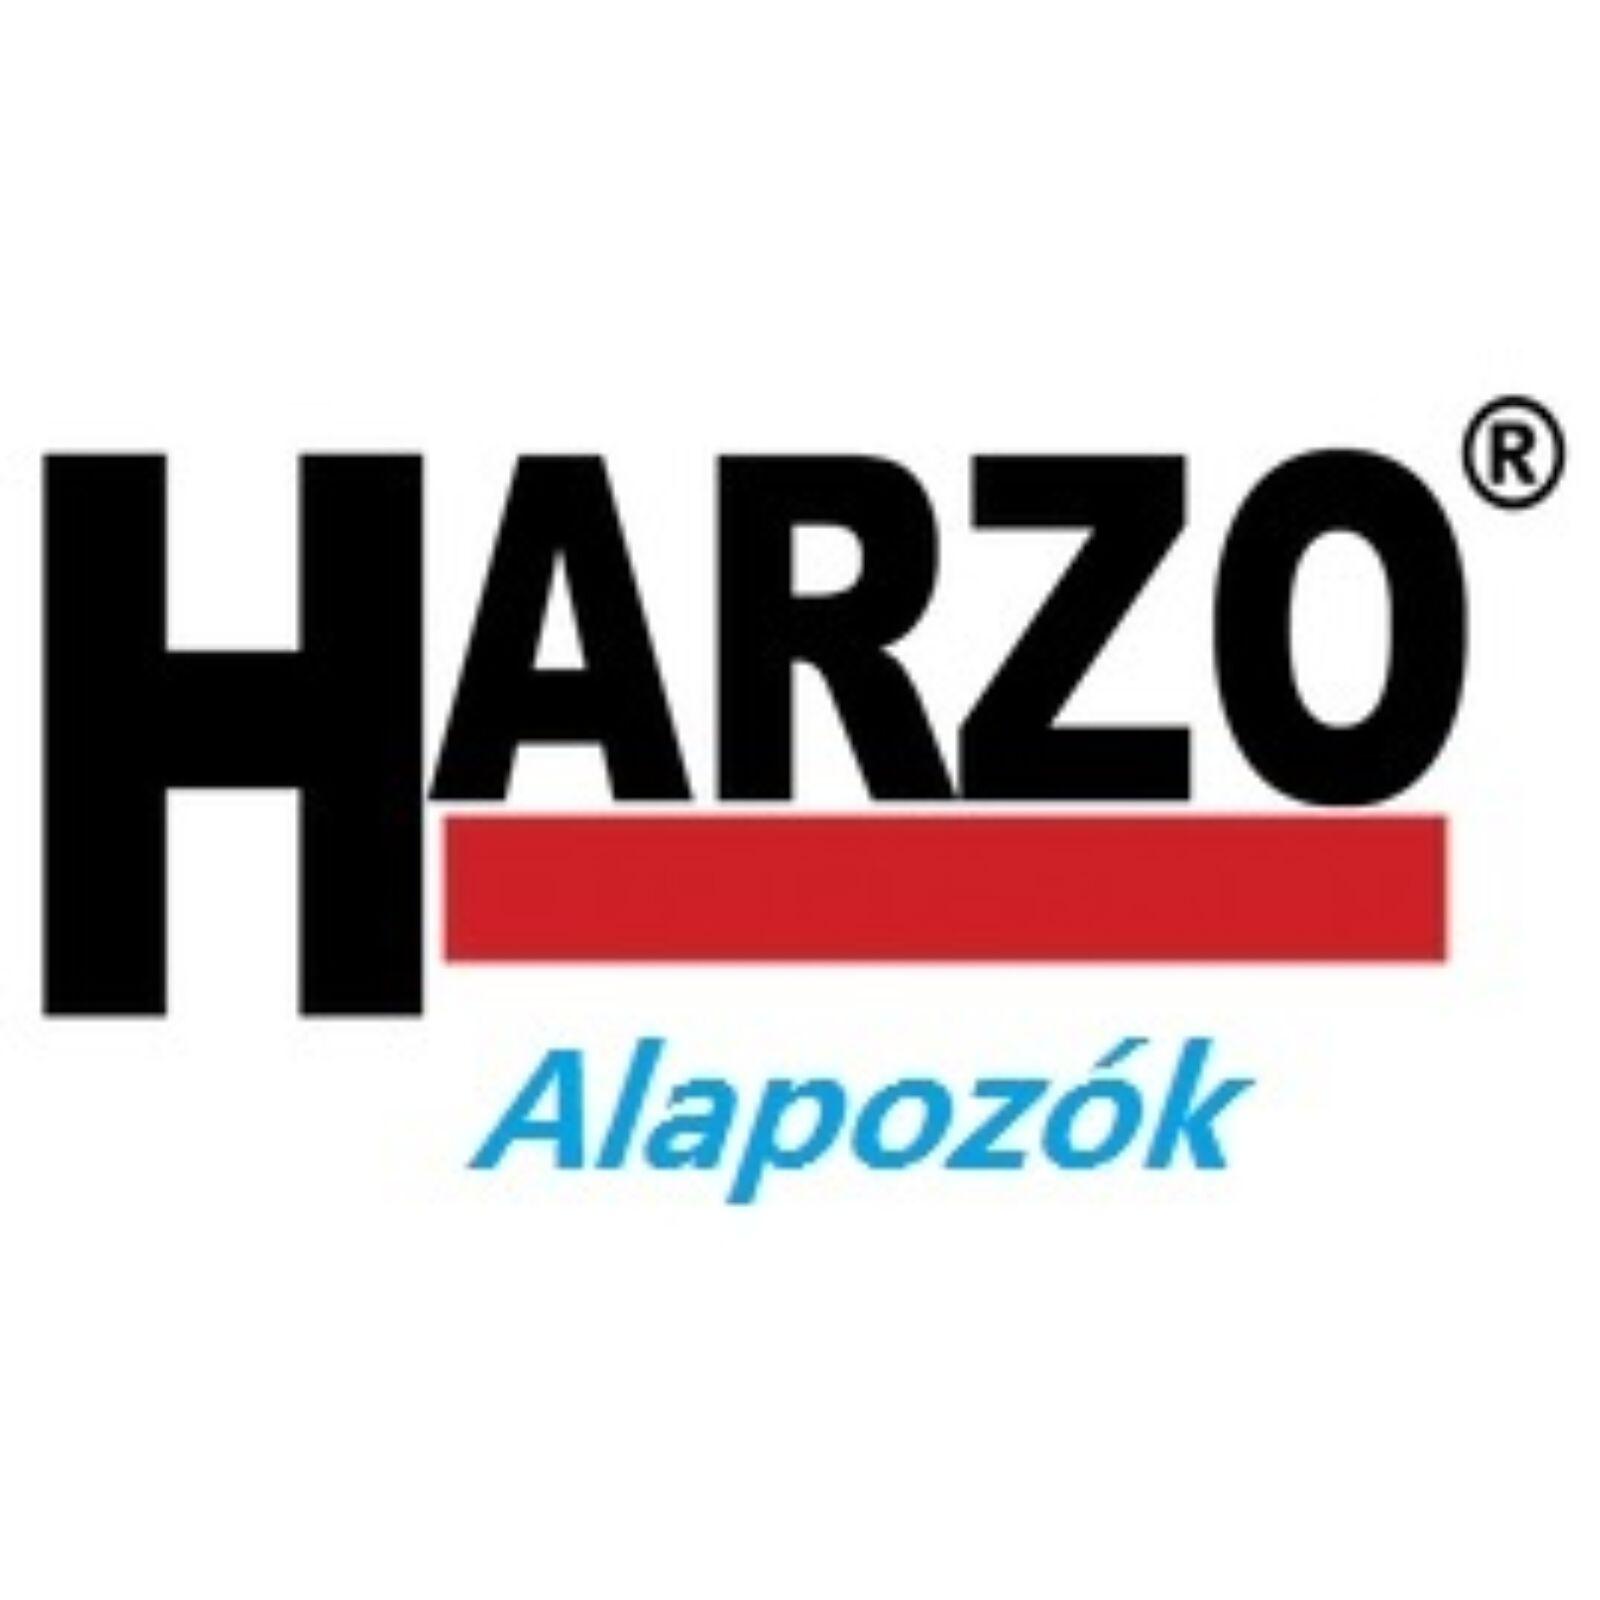 HARZO-Pw 100 prémium fal alapozó [4 l]